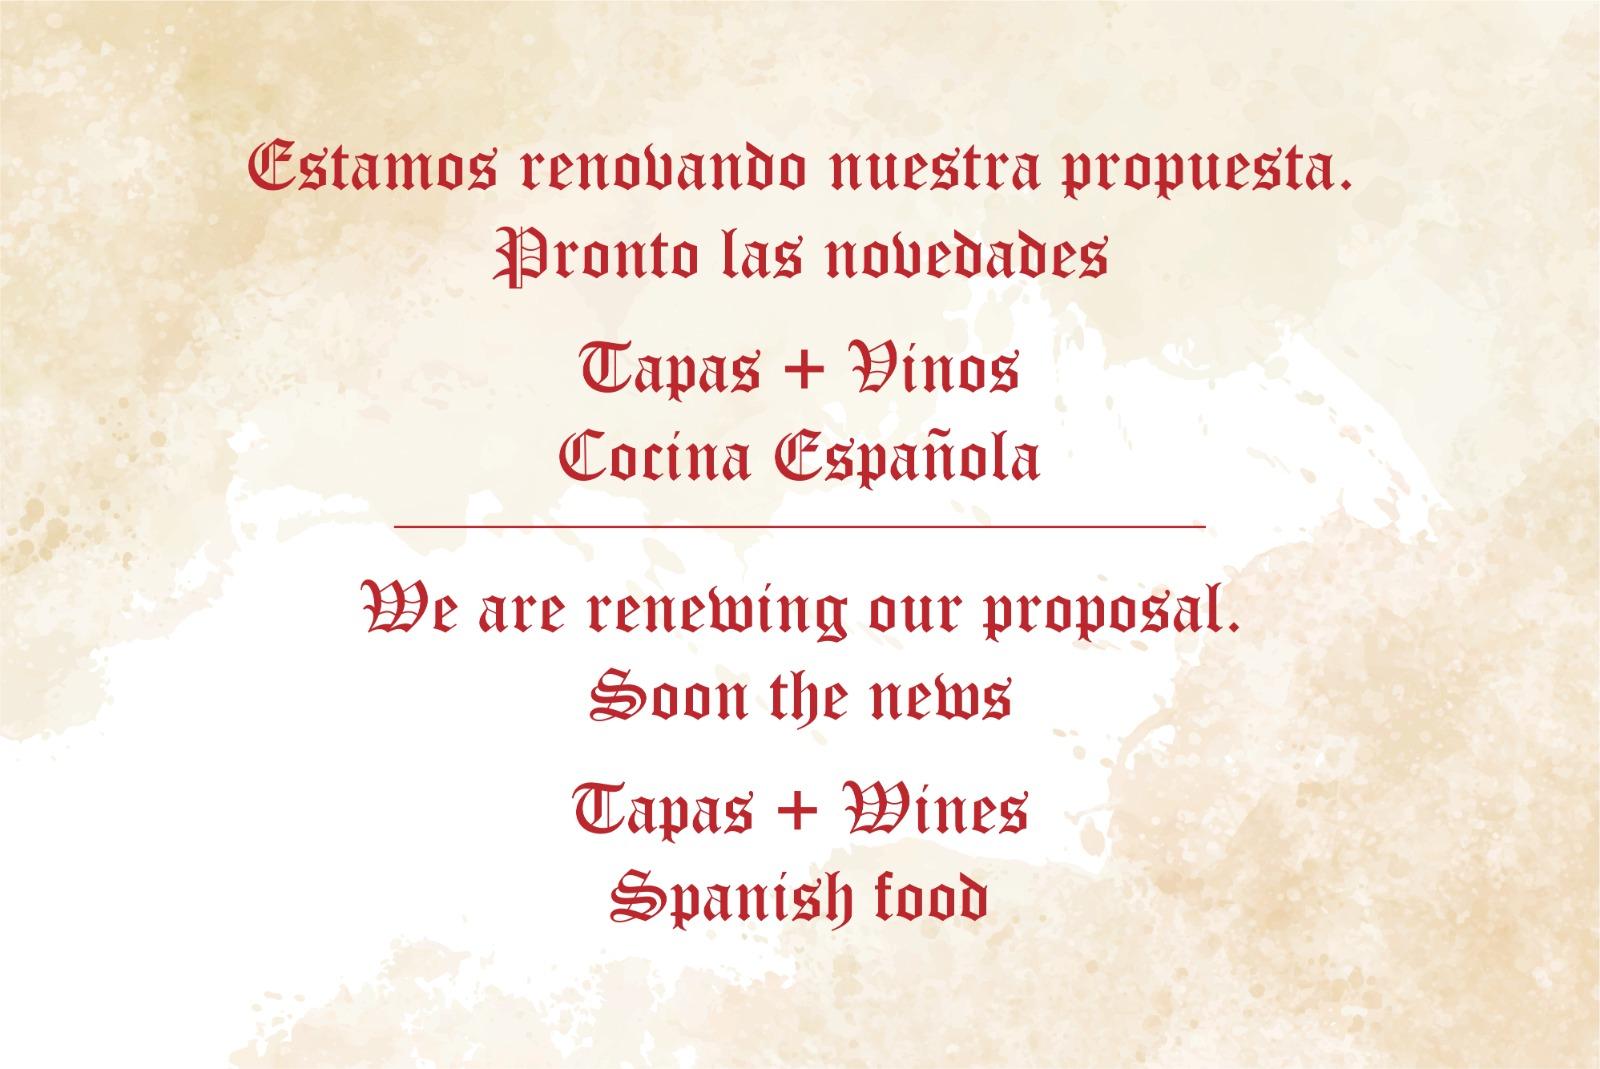 Wine menu for el meson de cervantes malaga for Table 52 wine list